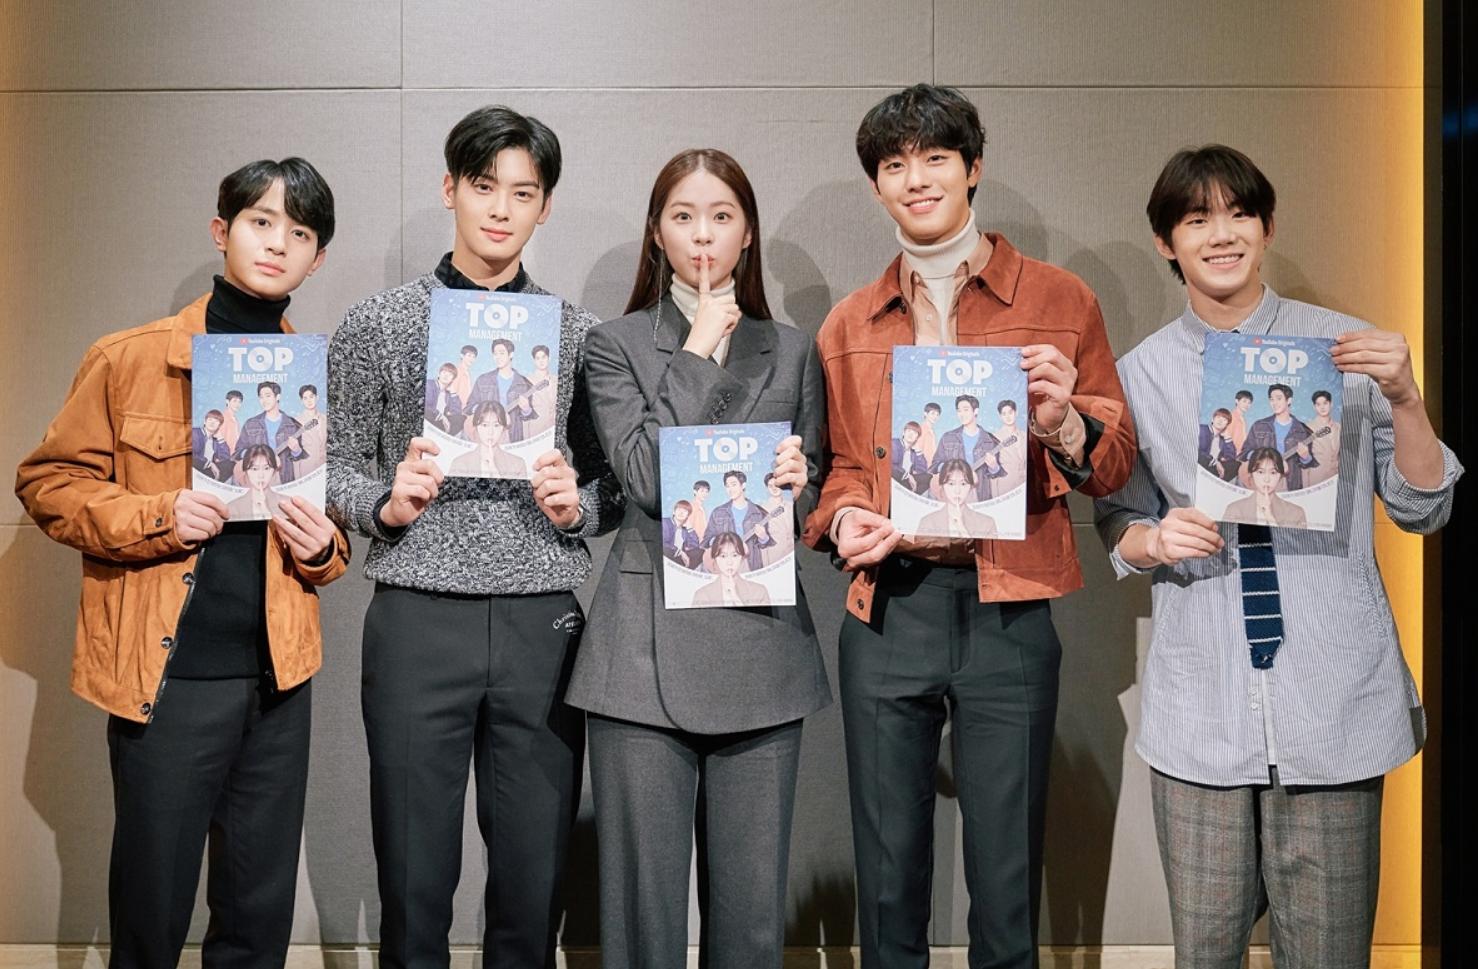 top management cast, top management summary, top management drama, cha eunwoo drama 2018